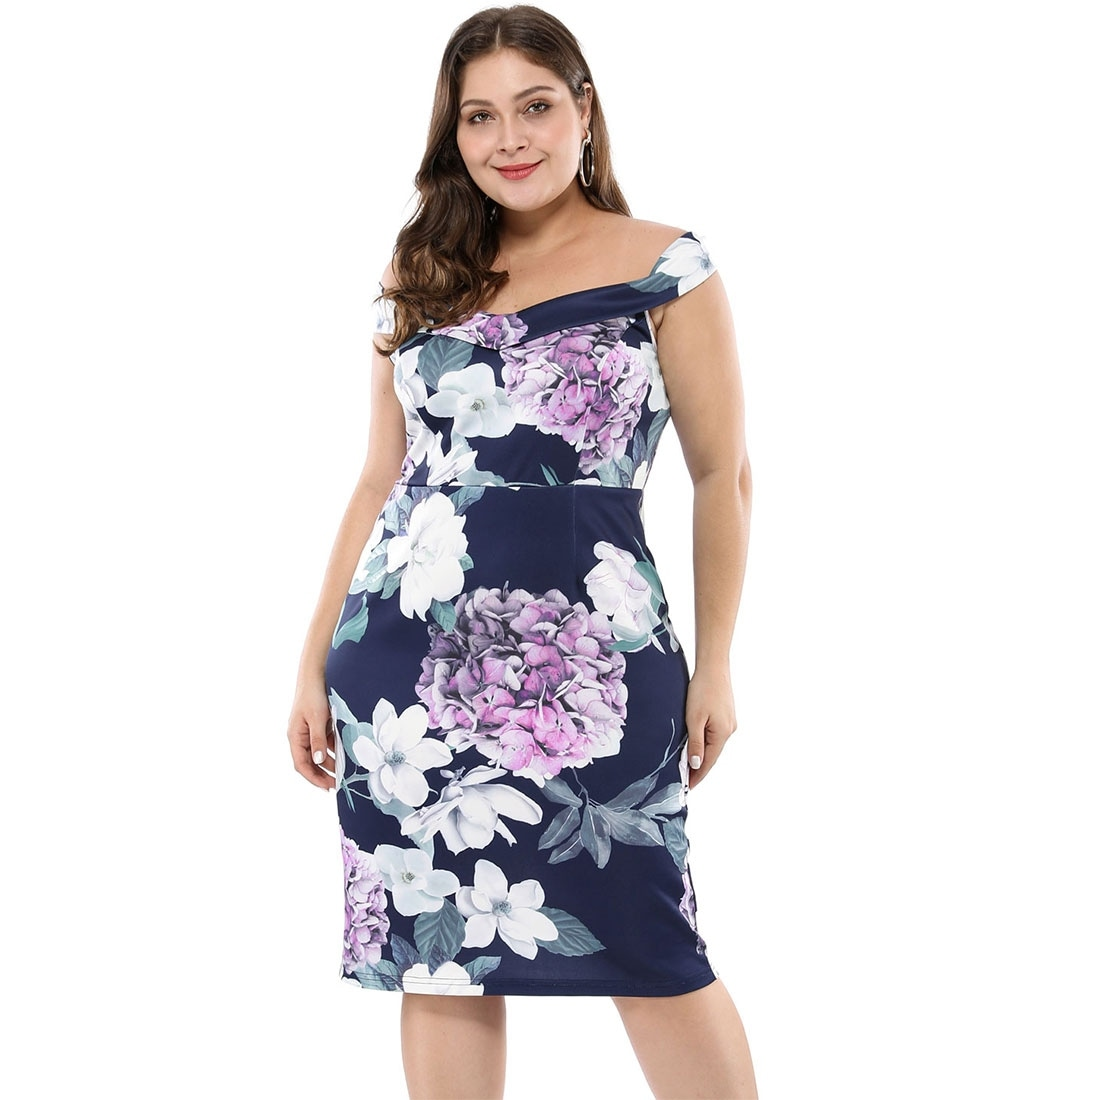 Women S Floral Print Off Shoulder Plus Size Cocktail Dress Blue Overstock 28338249